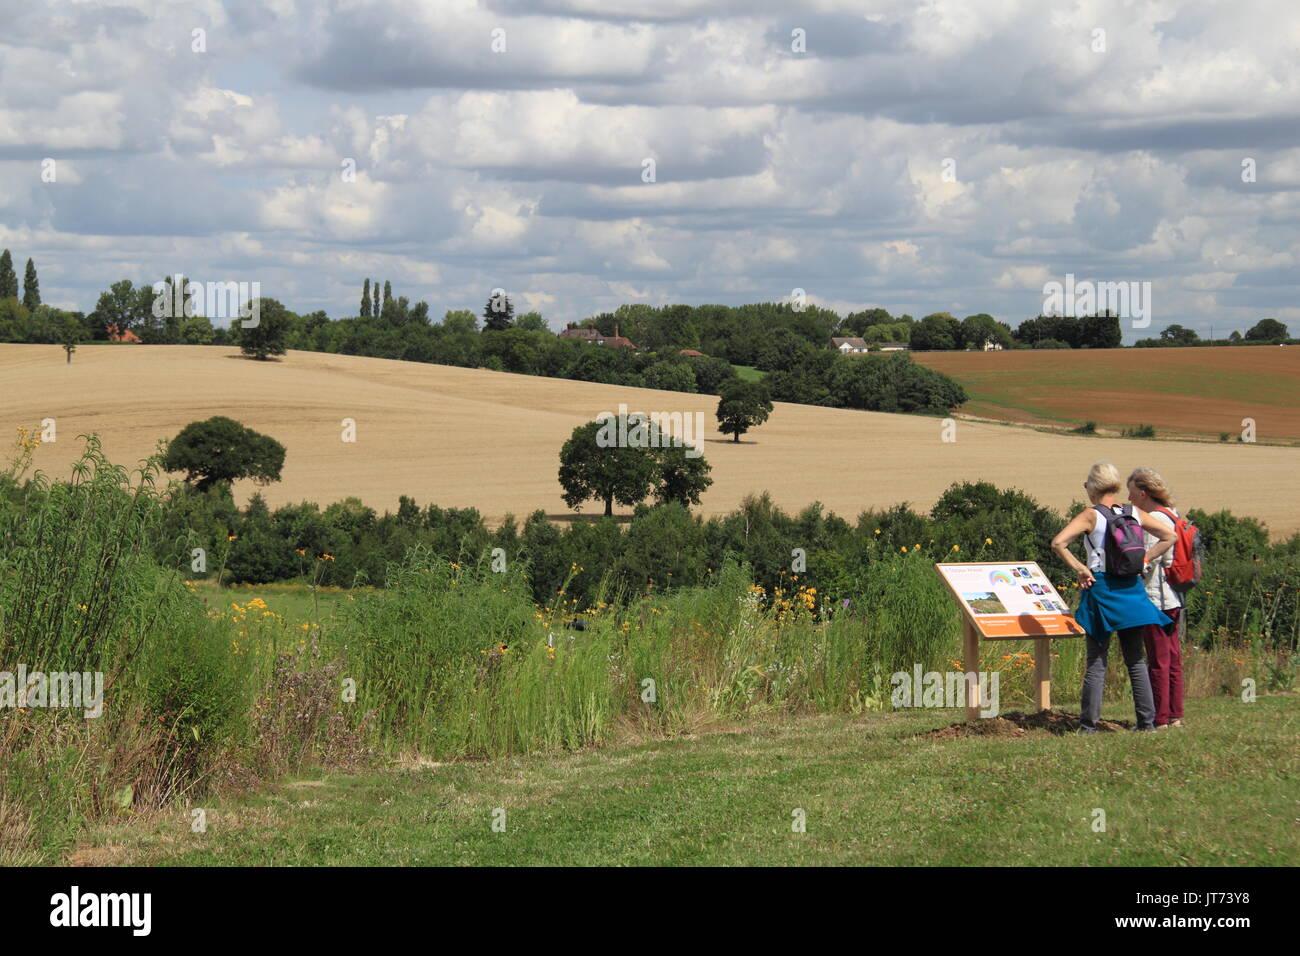 Big Sky Meadow, RHS Garden Hyde Hall Flower Show 2017, Chelmsford, Essex, England, Great Britain, United Kingdom, UK, Europe - Stock Image